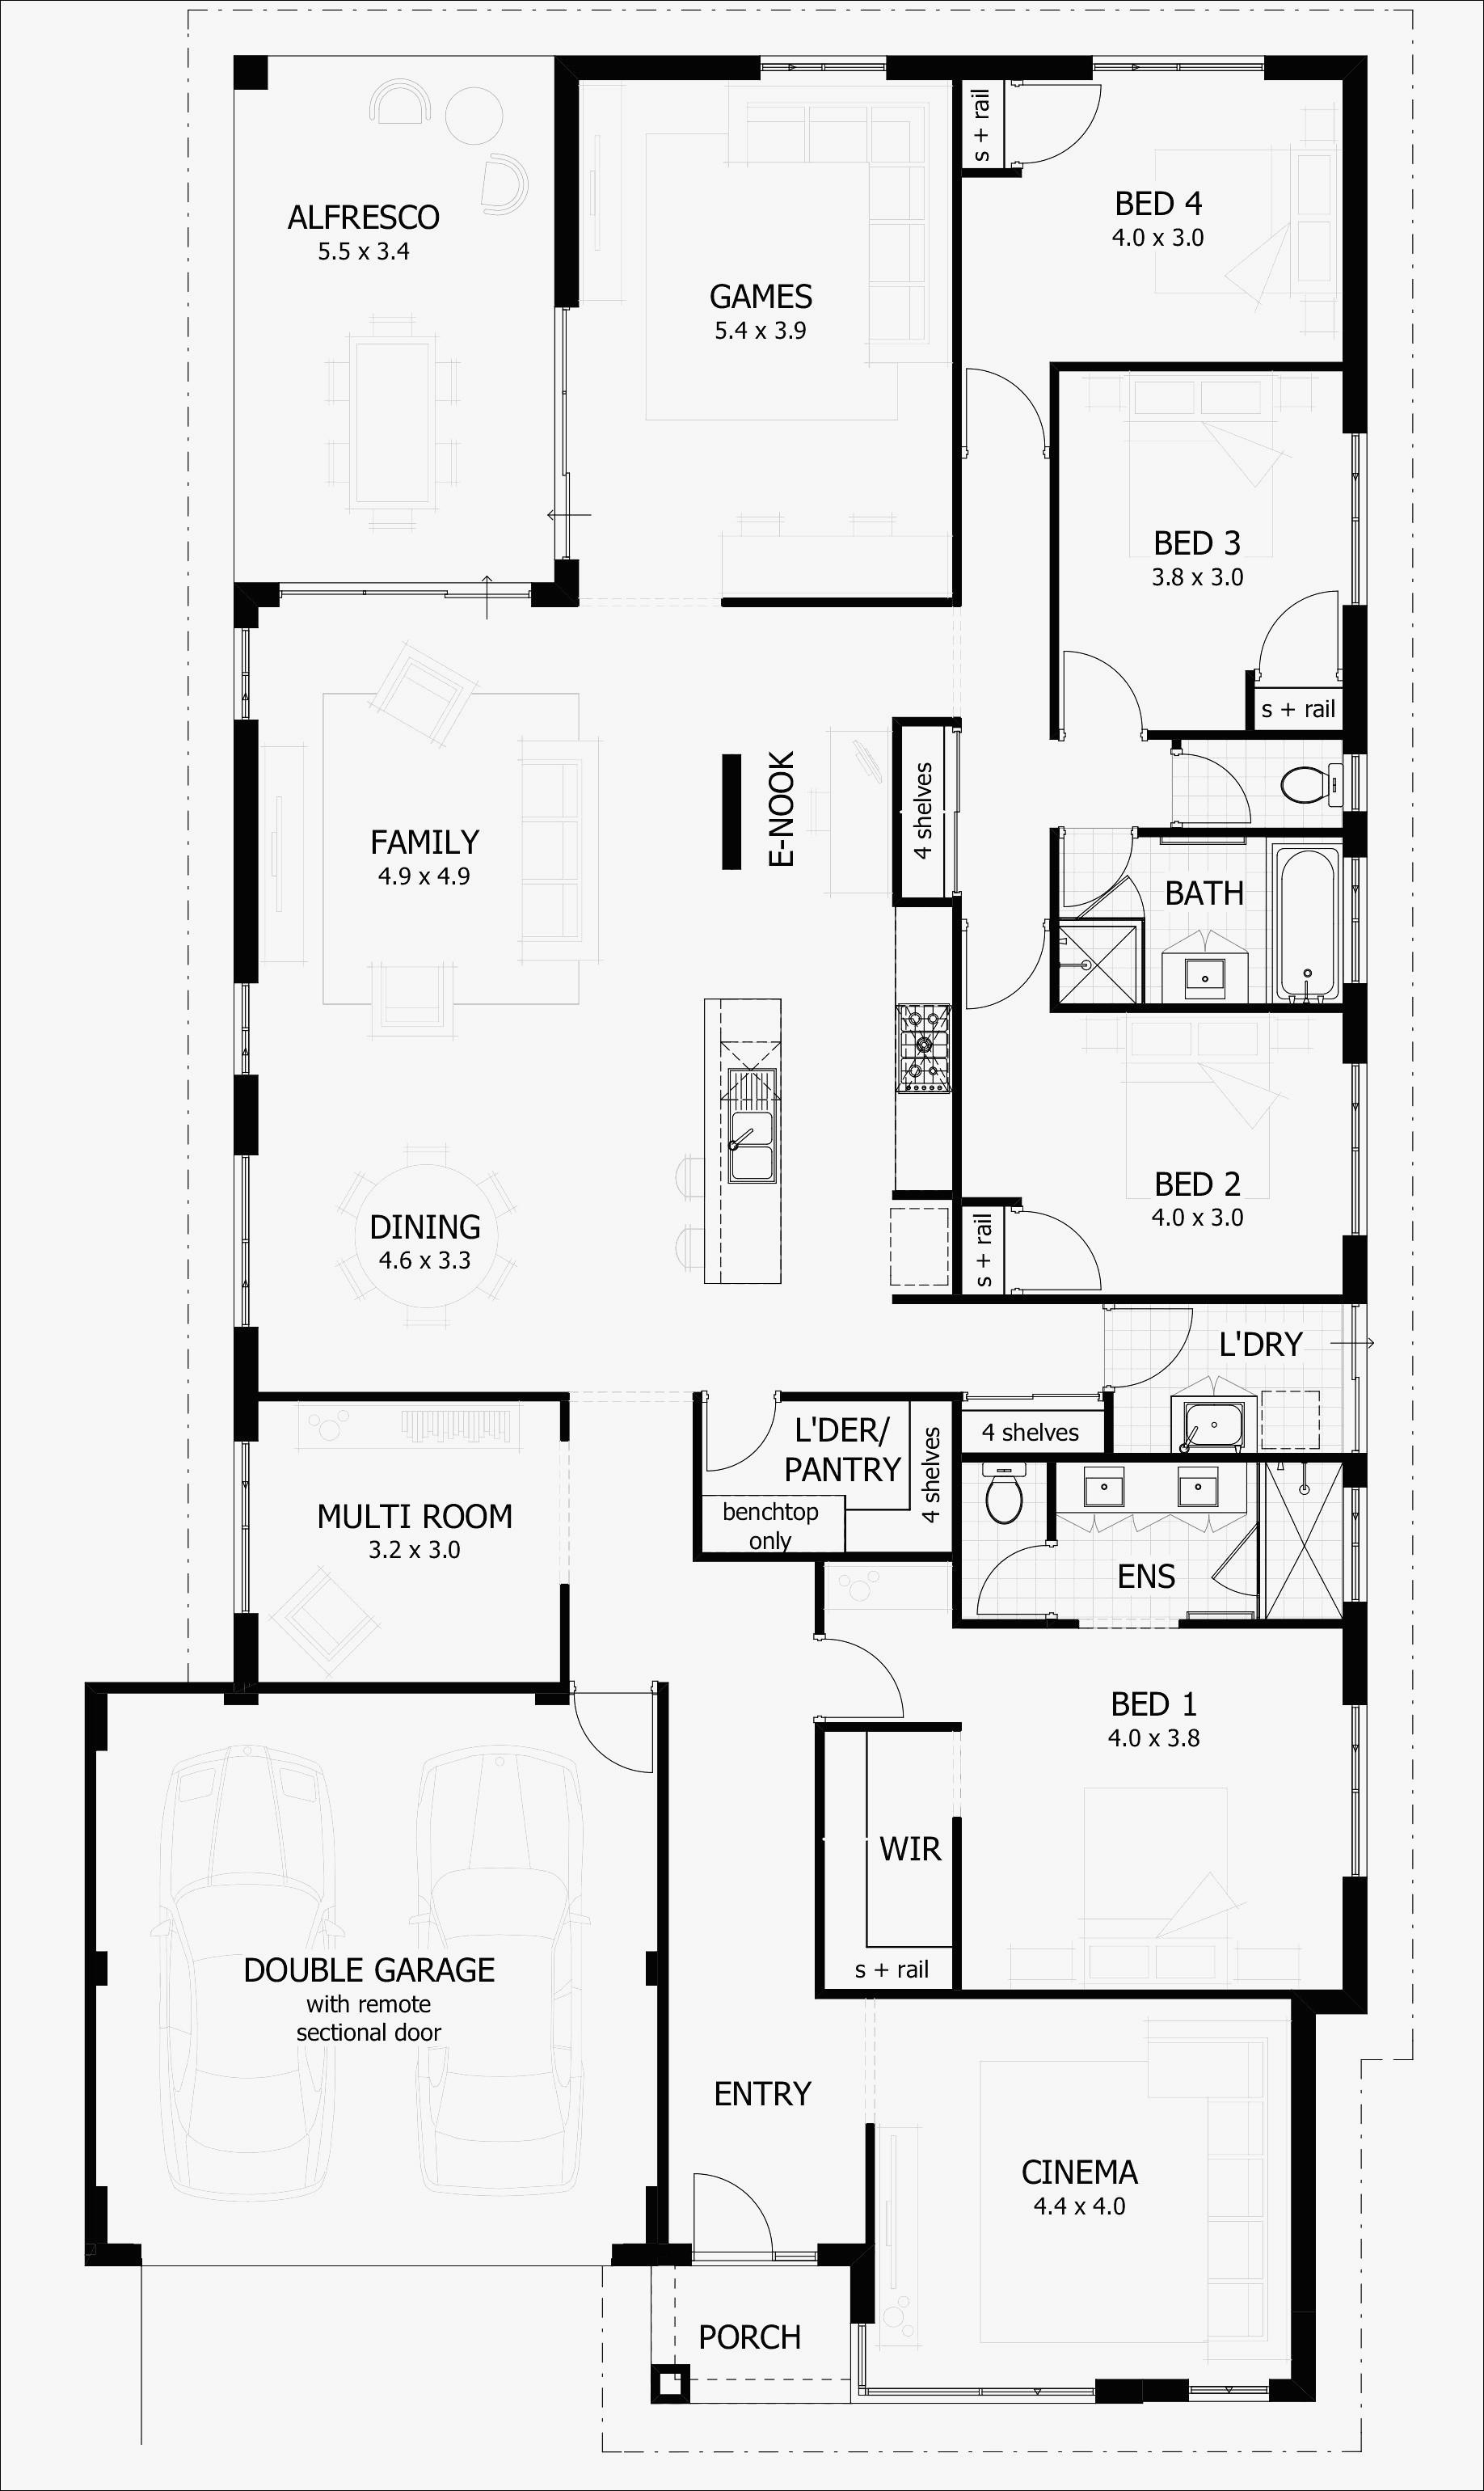 Marlette Homes Floor Plans Fresh Marlette Mobile Home Wiring - Manufactured Home Wiring Diagram